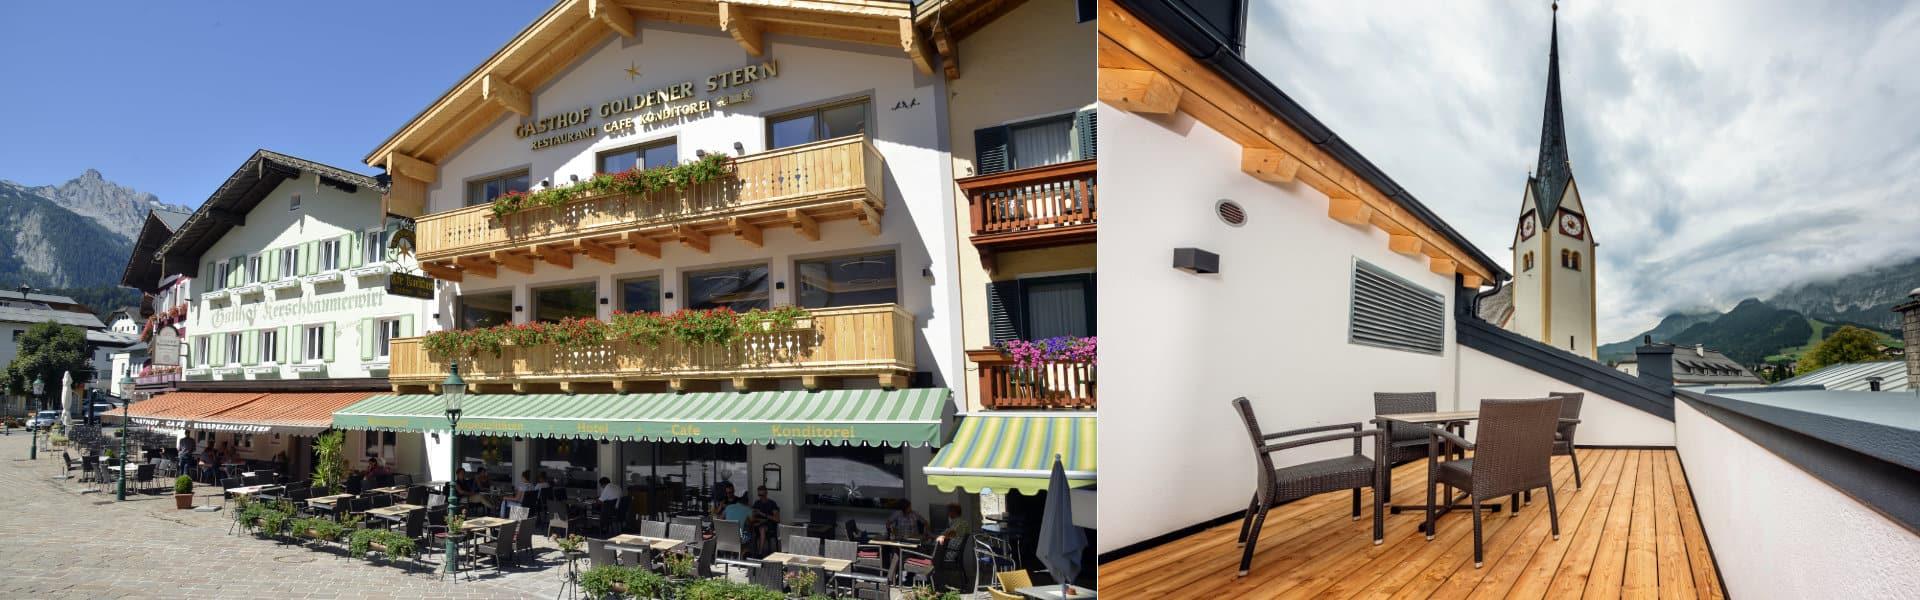 Hotel der Goldene Stern Abtenau